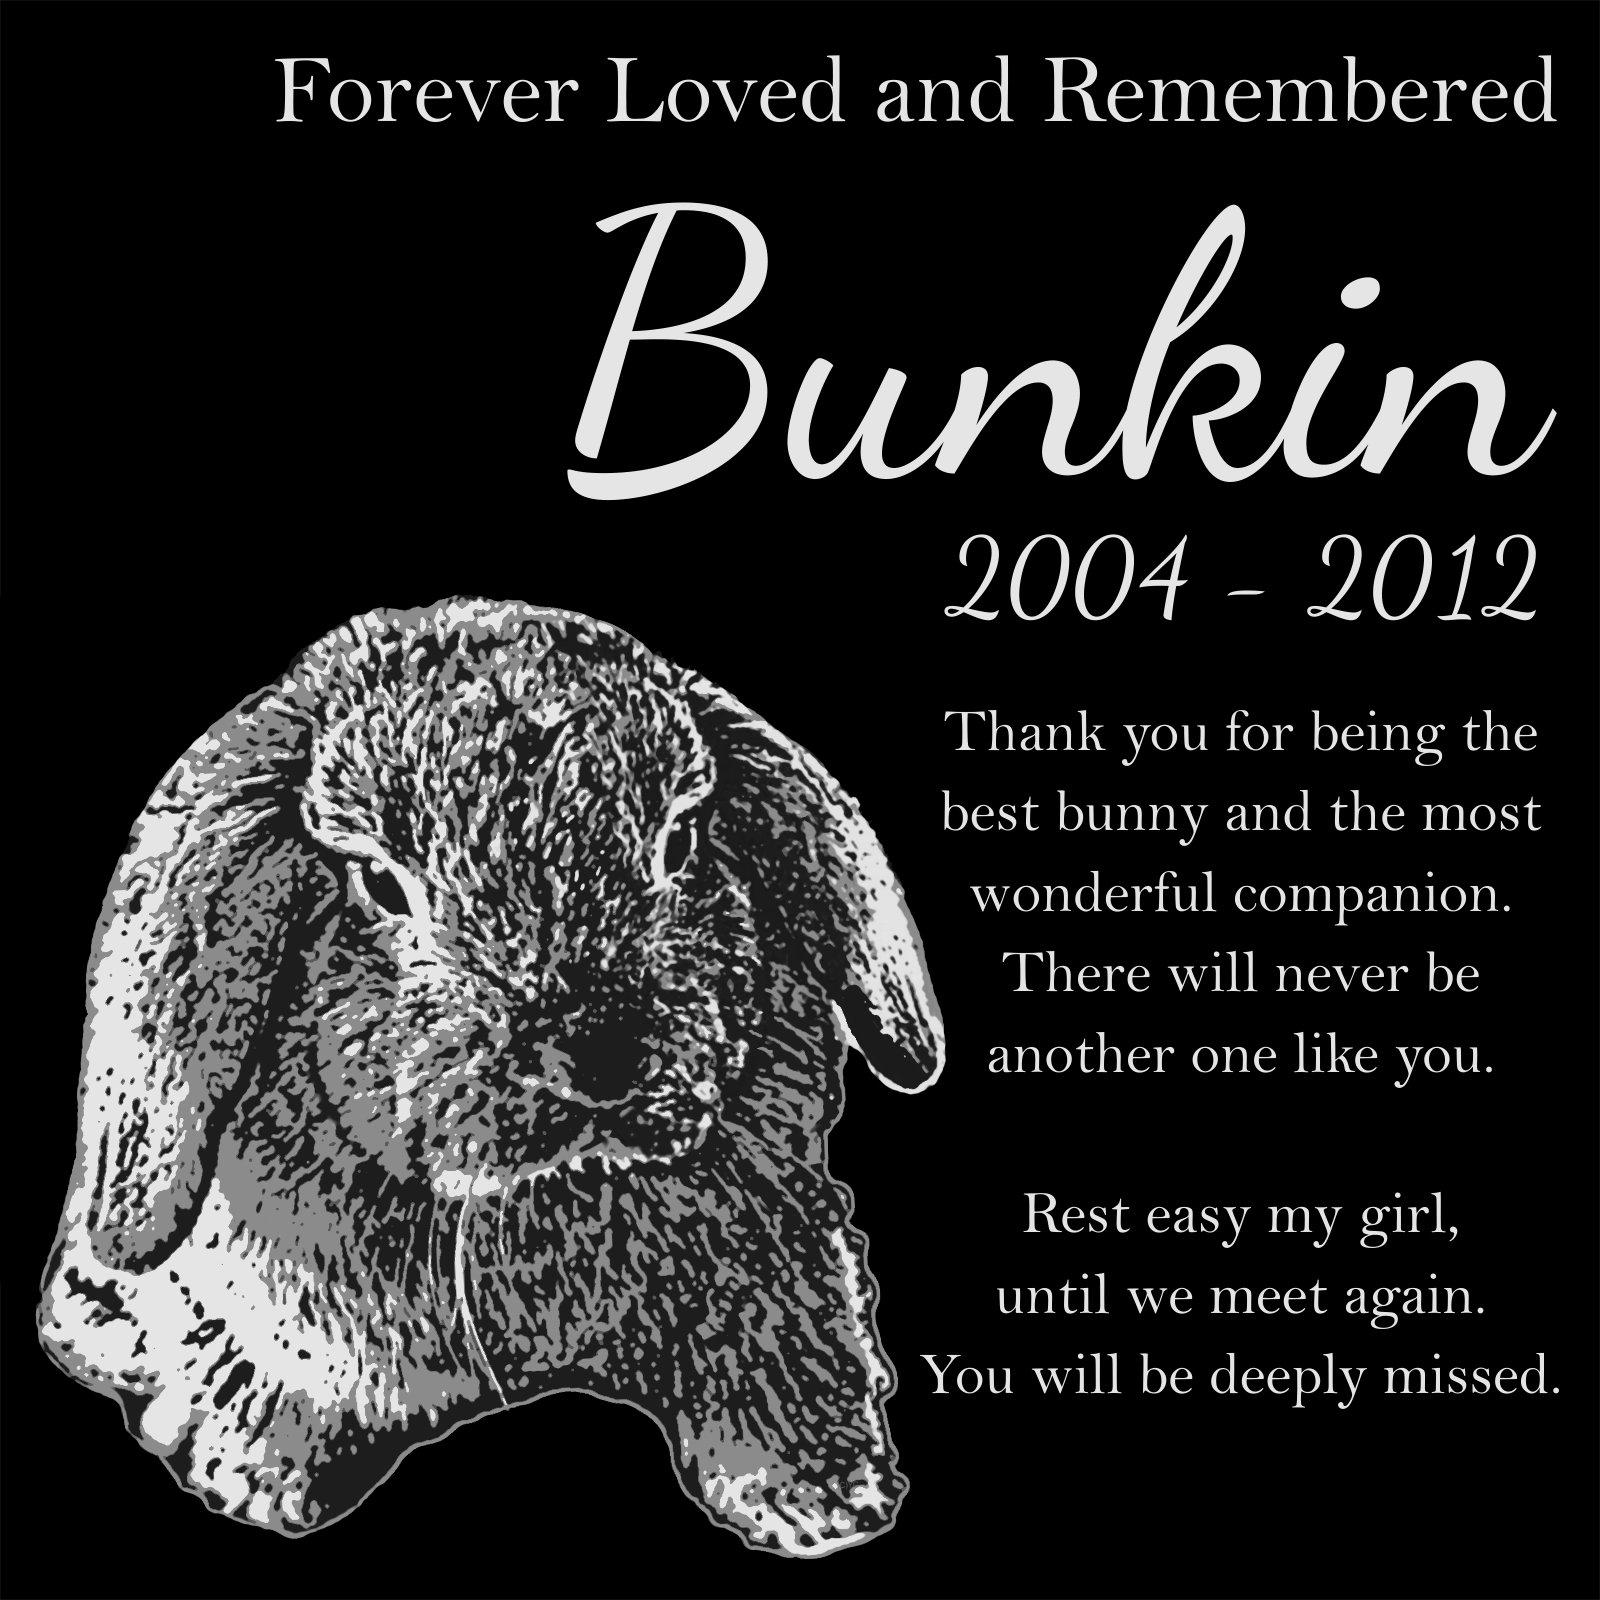 Personalized Lop Eared Rabbit Bunny Pet Memorial 12''x12'' Custom Engraved Black Granite Grave Marker Head Stone Plaque BUN1